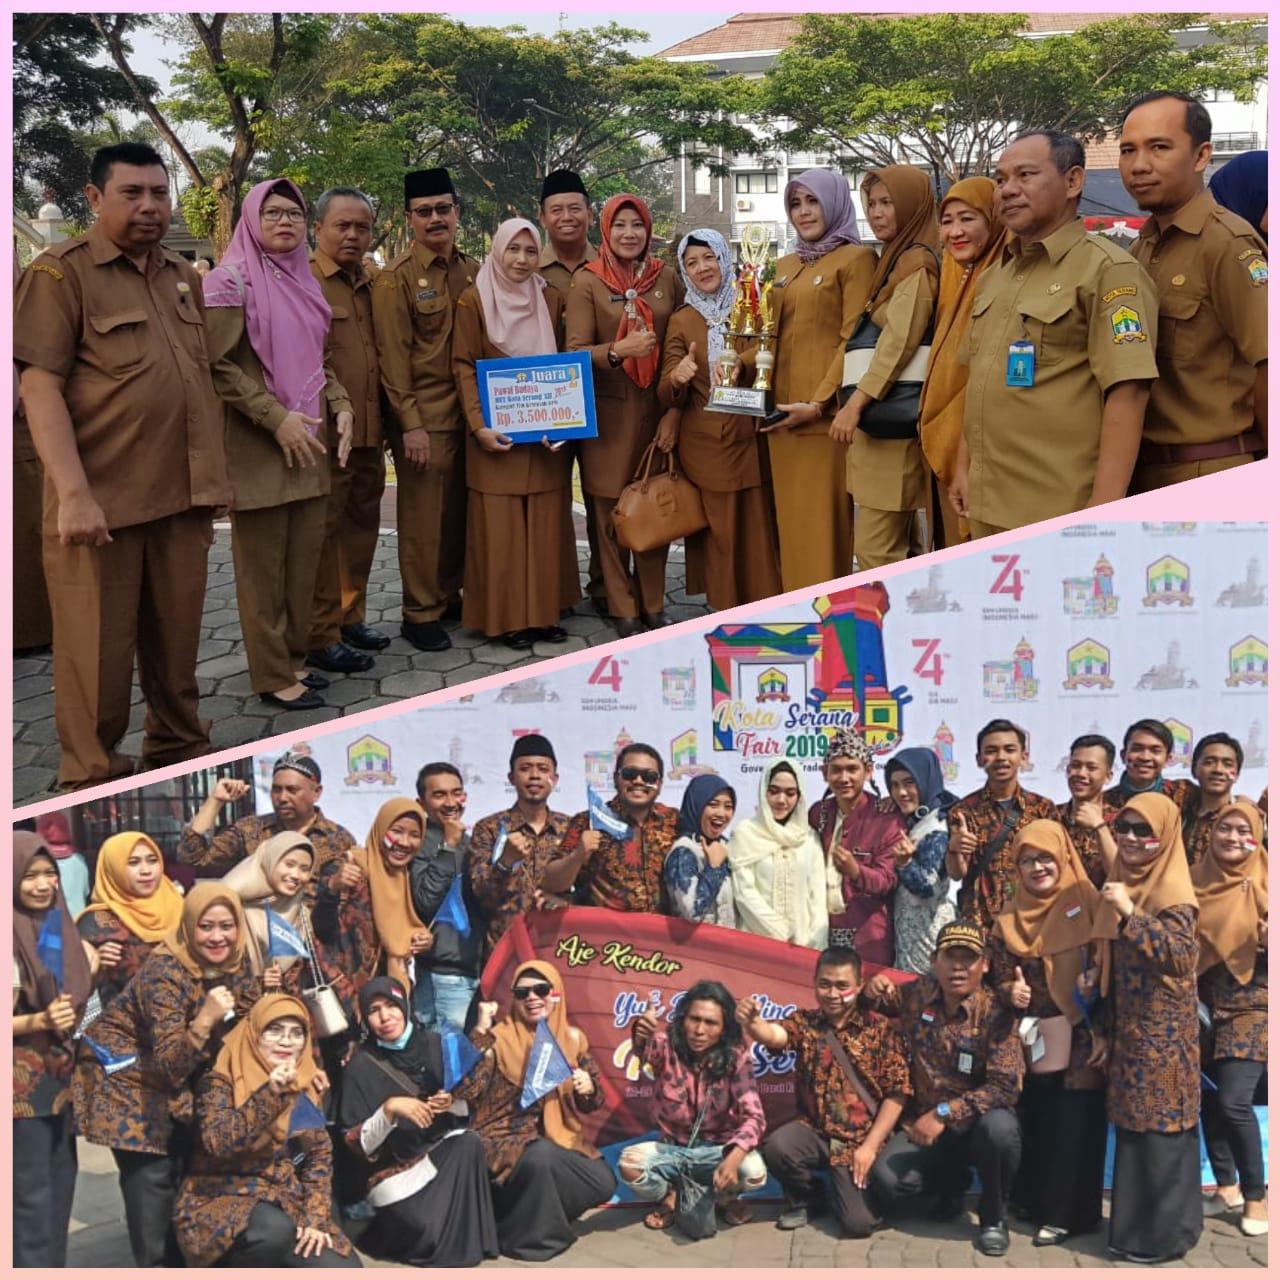 Semarak HUT Kota Serang Ke-12 Dinas Sosial Meraih Juara ke 2 Pawai Budaya kategori Tim Kesenian OPD